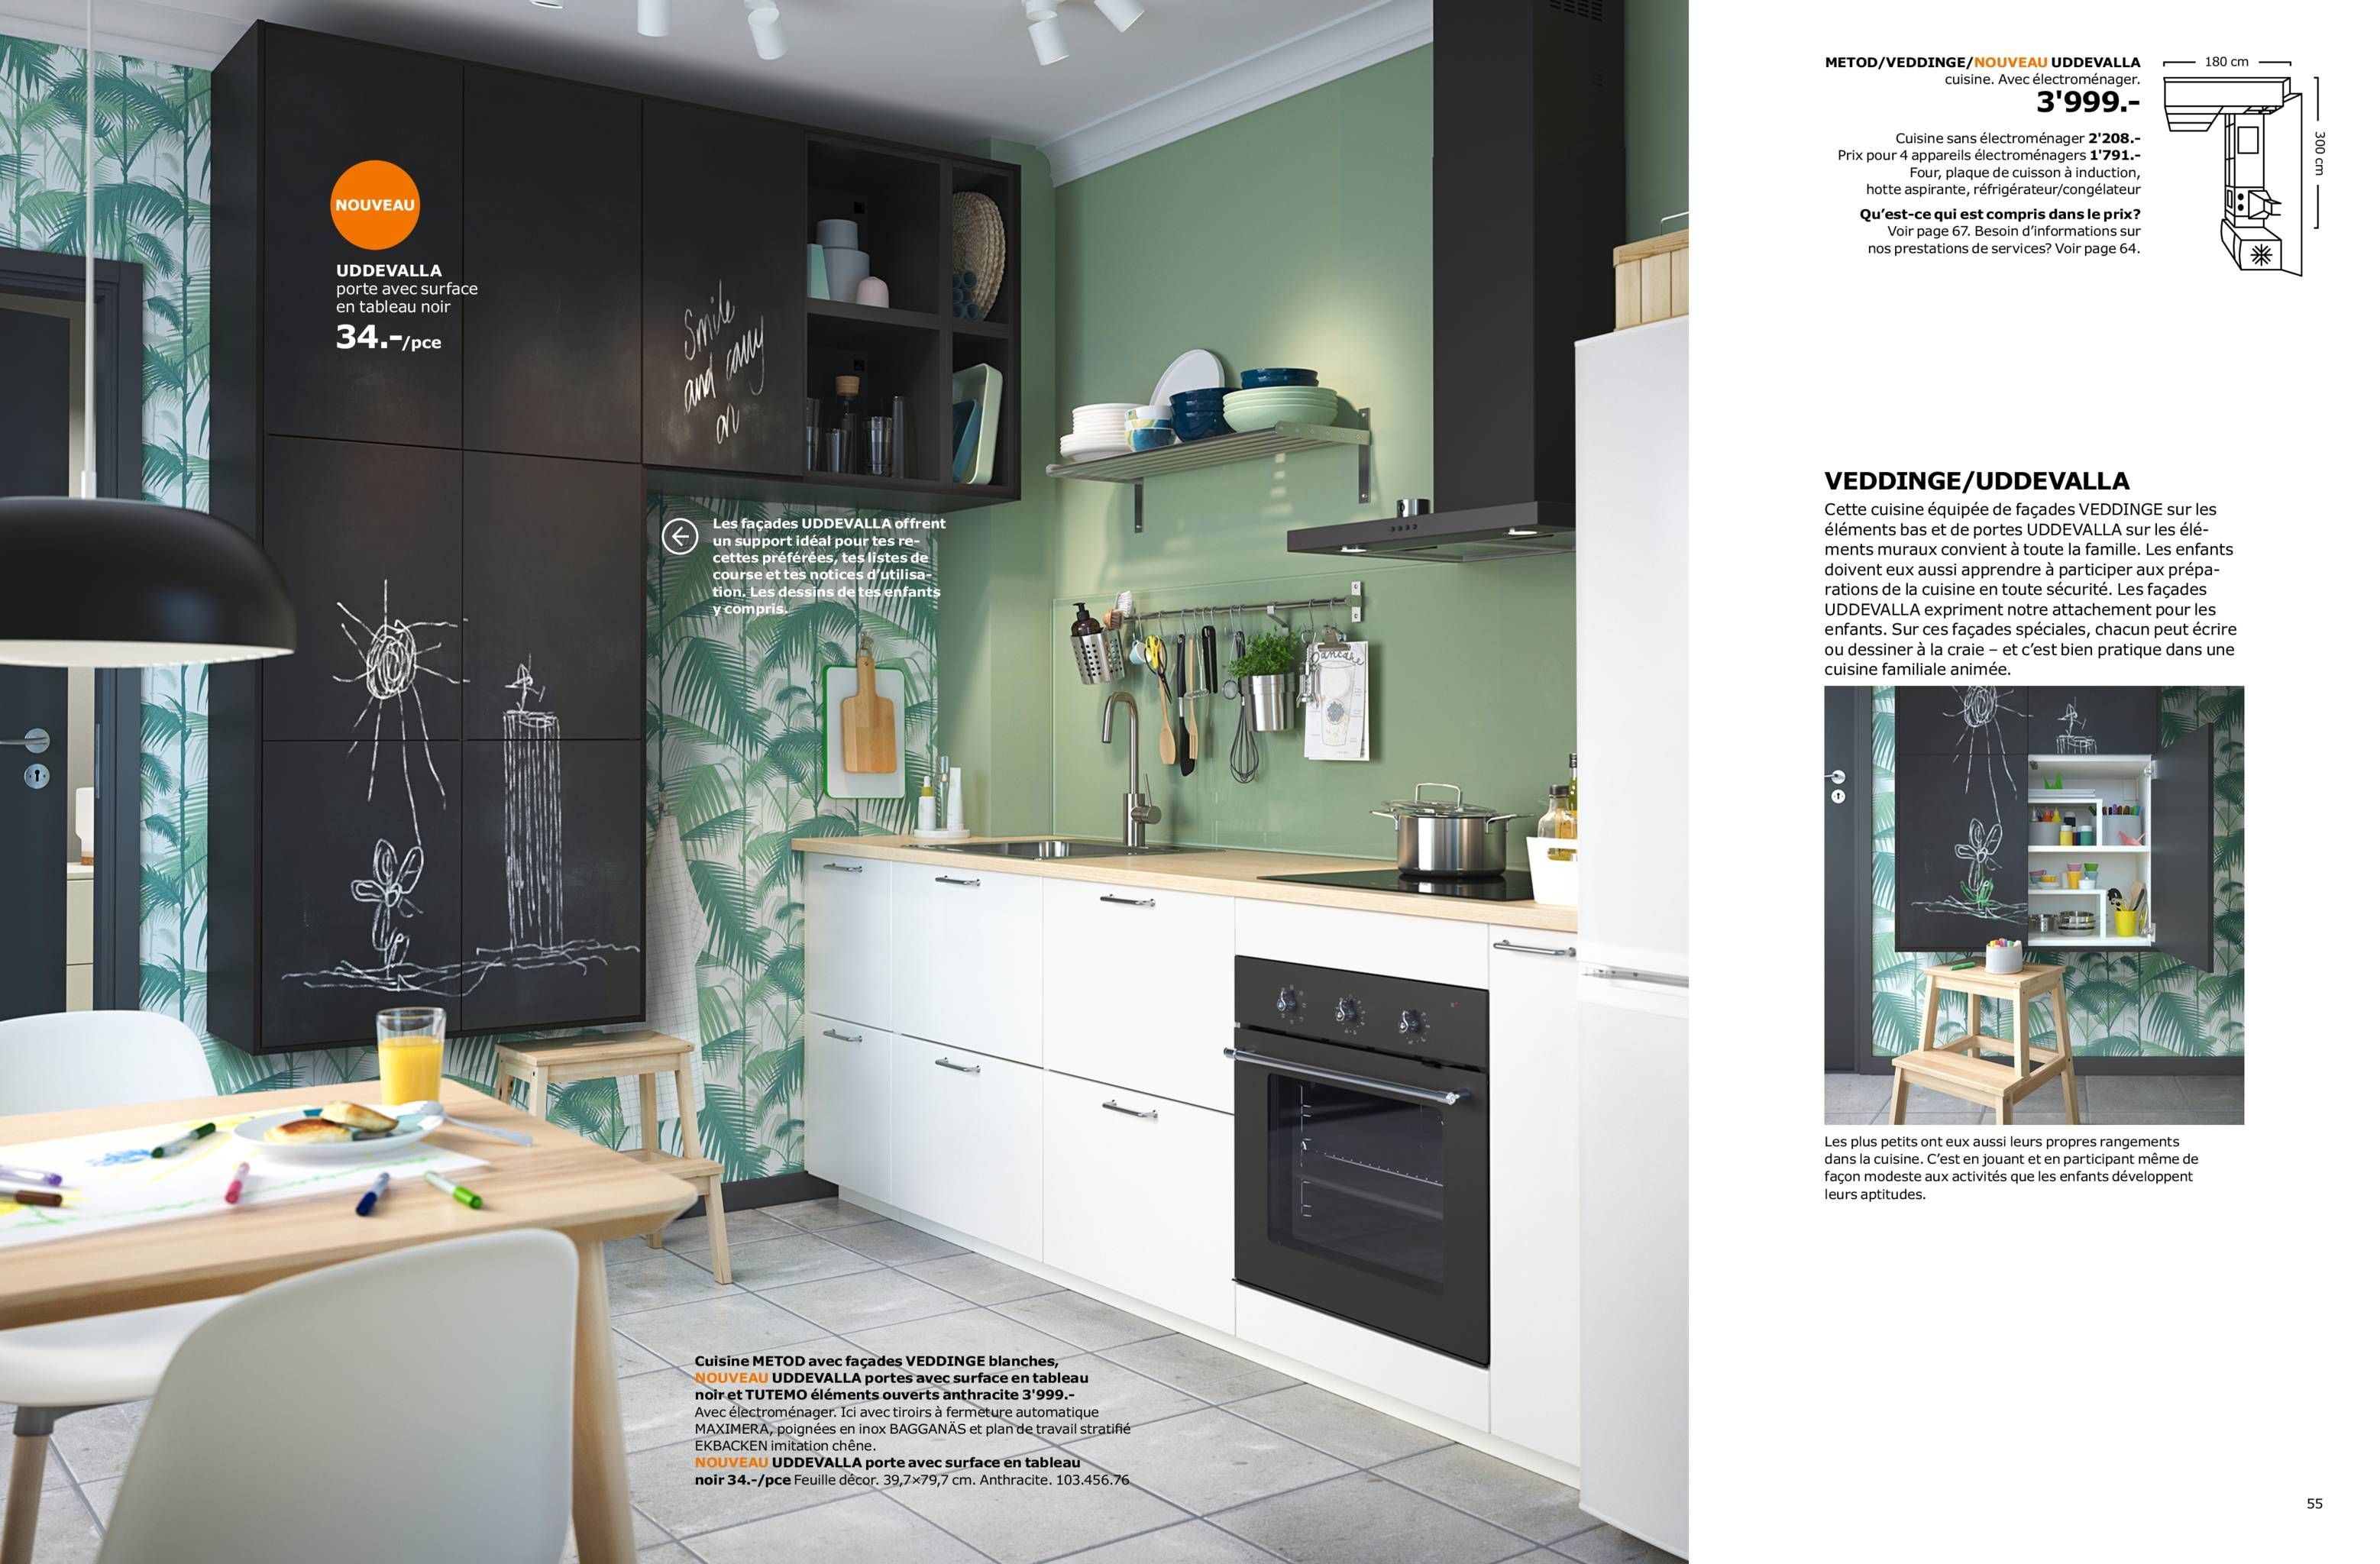 Prix Cuisine Ikea Sans Electromenager cuisines 2018 | mobilier de salon, ikea